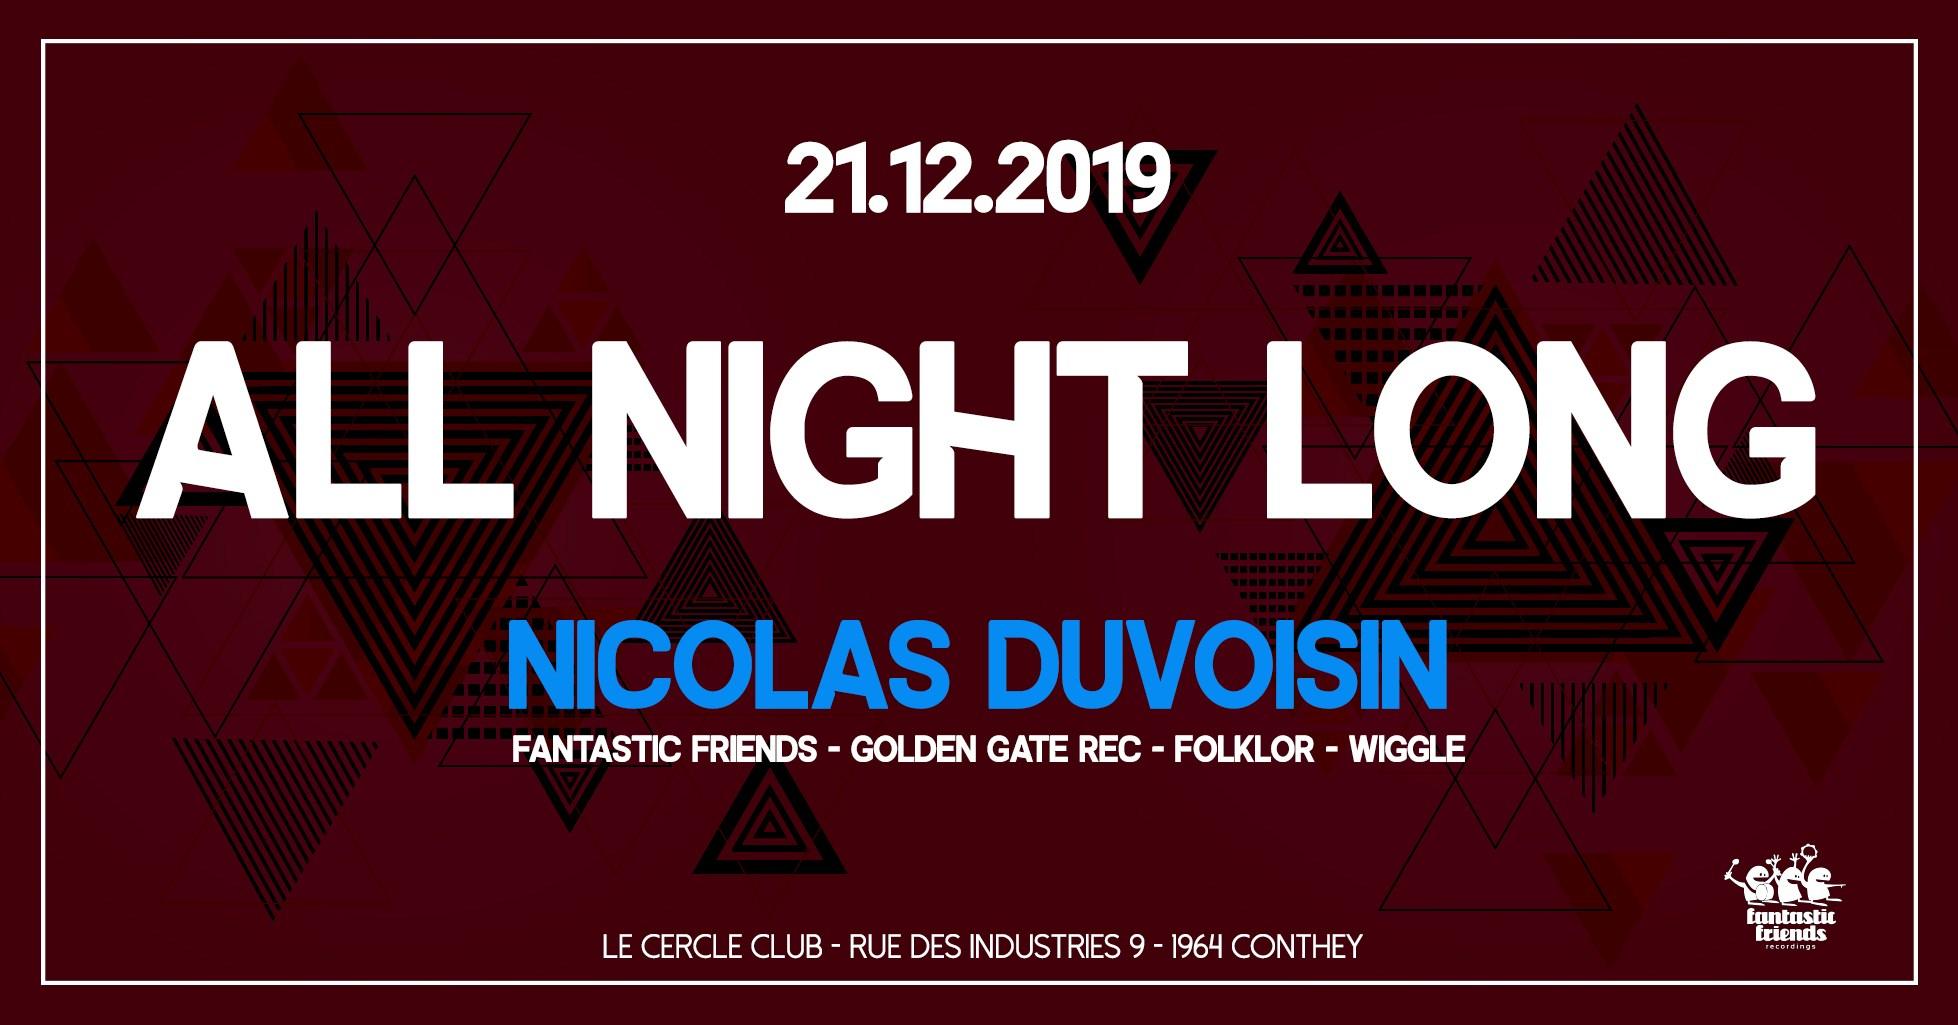 All Night long: Nicolas Duvoisin at Le Cercle - 21.12.19